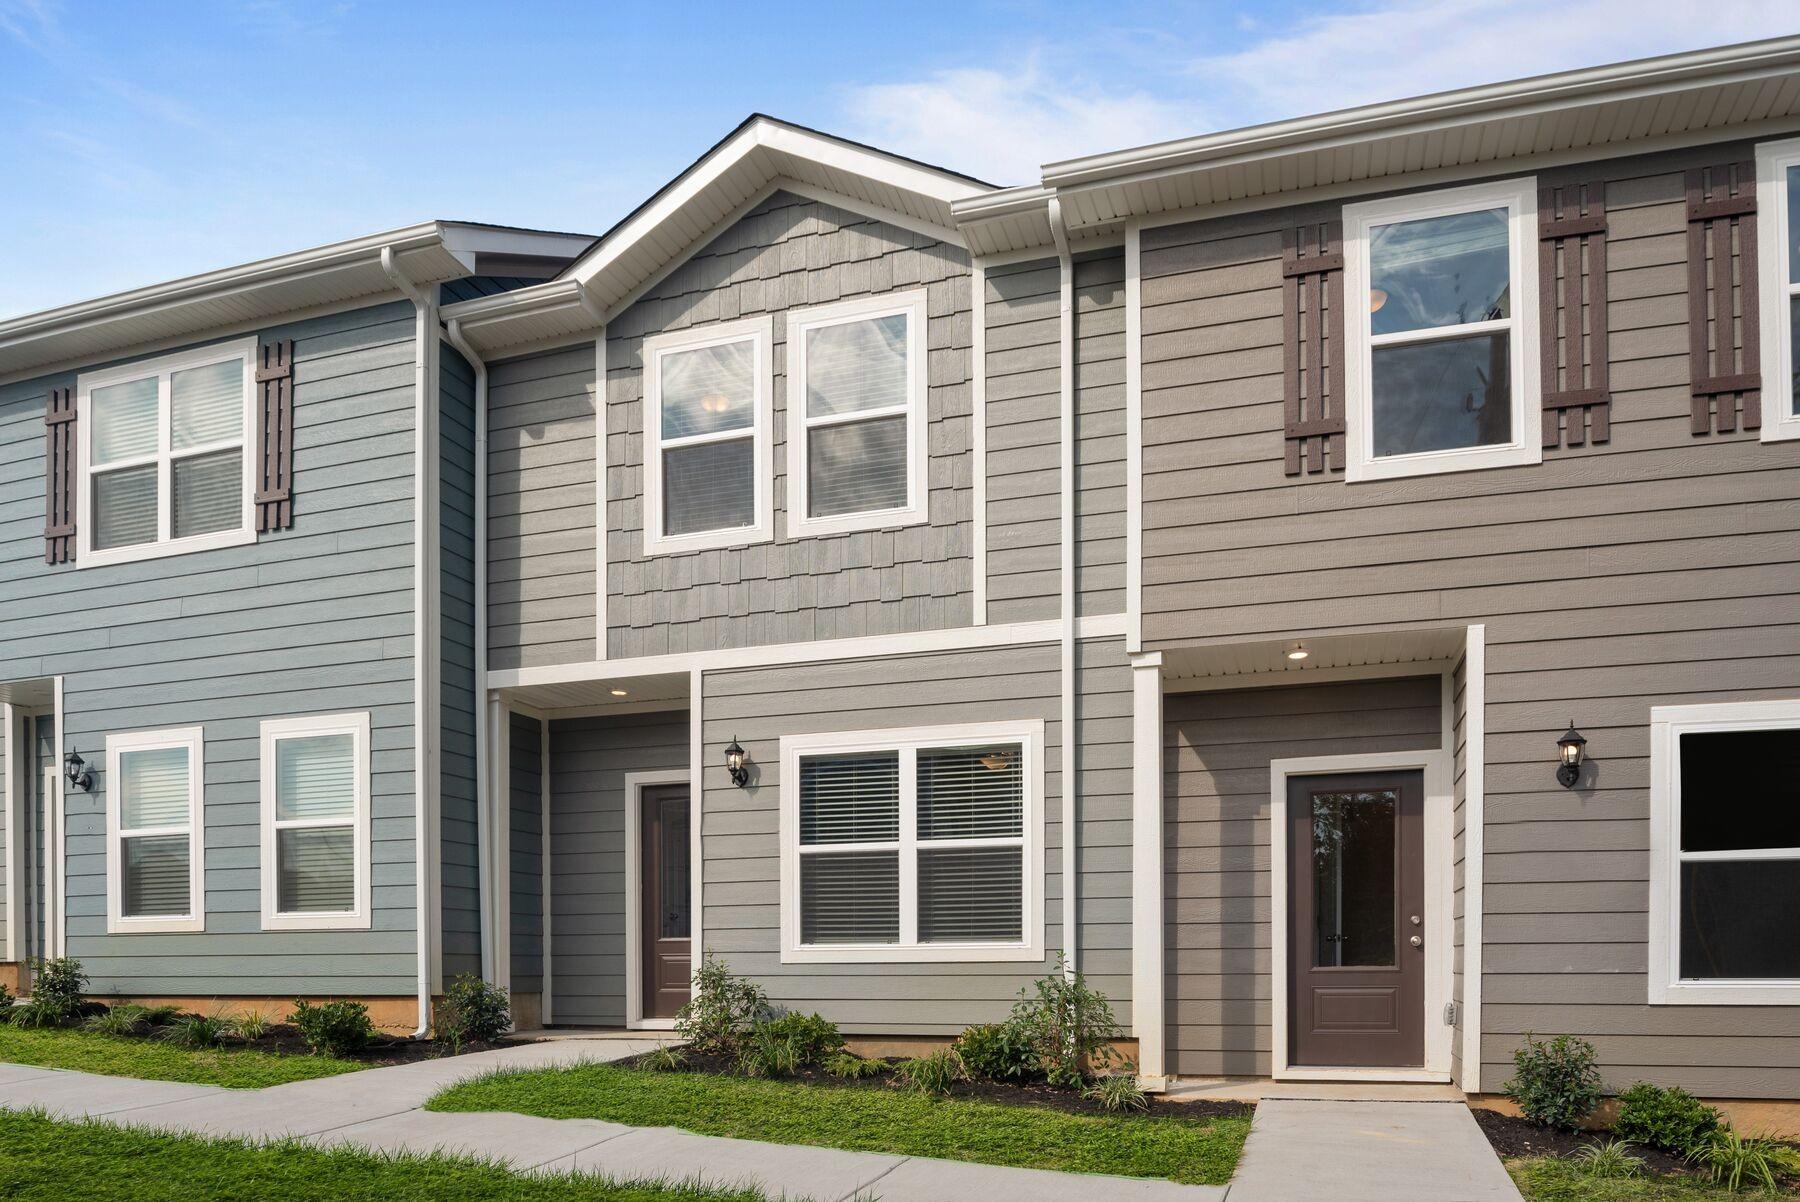 106 Ofner Drive, LA VERGNE, TN 37086 - LA VERGNE, TN real estate listing